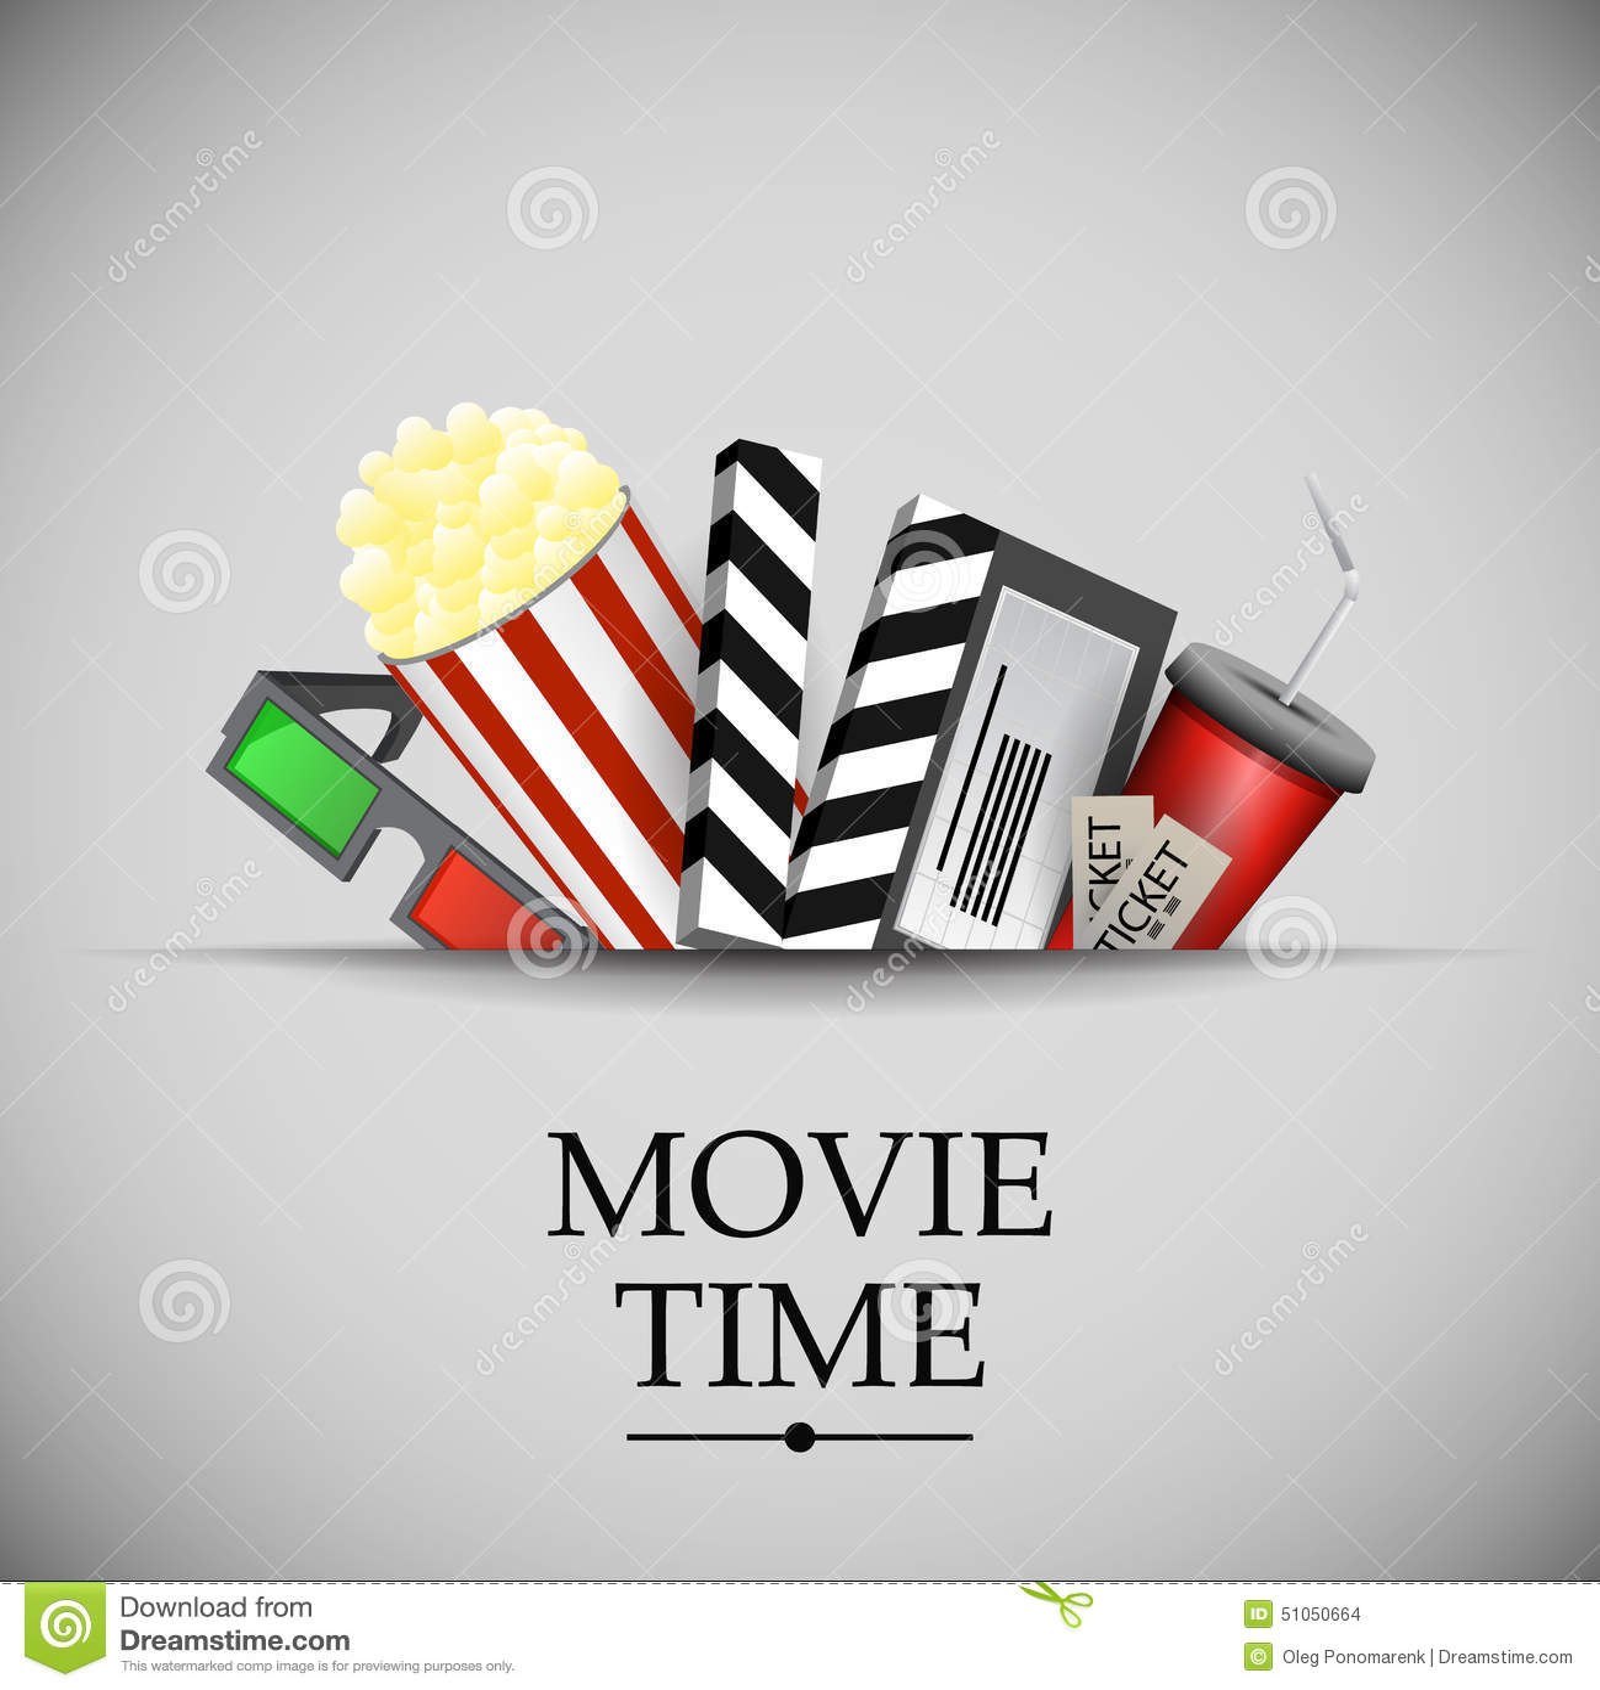 Cinema movie time stock illustration. Image of ...